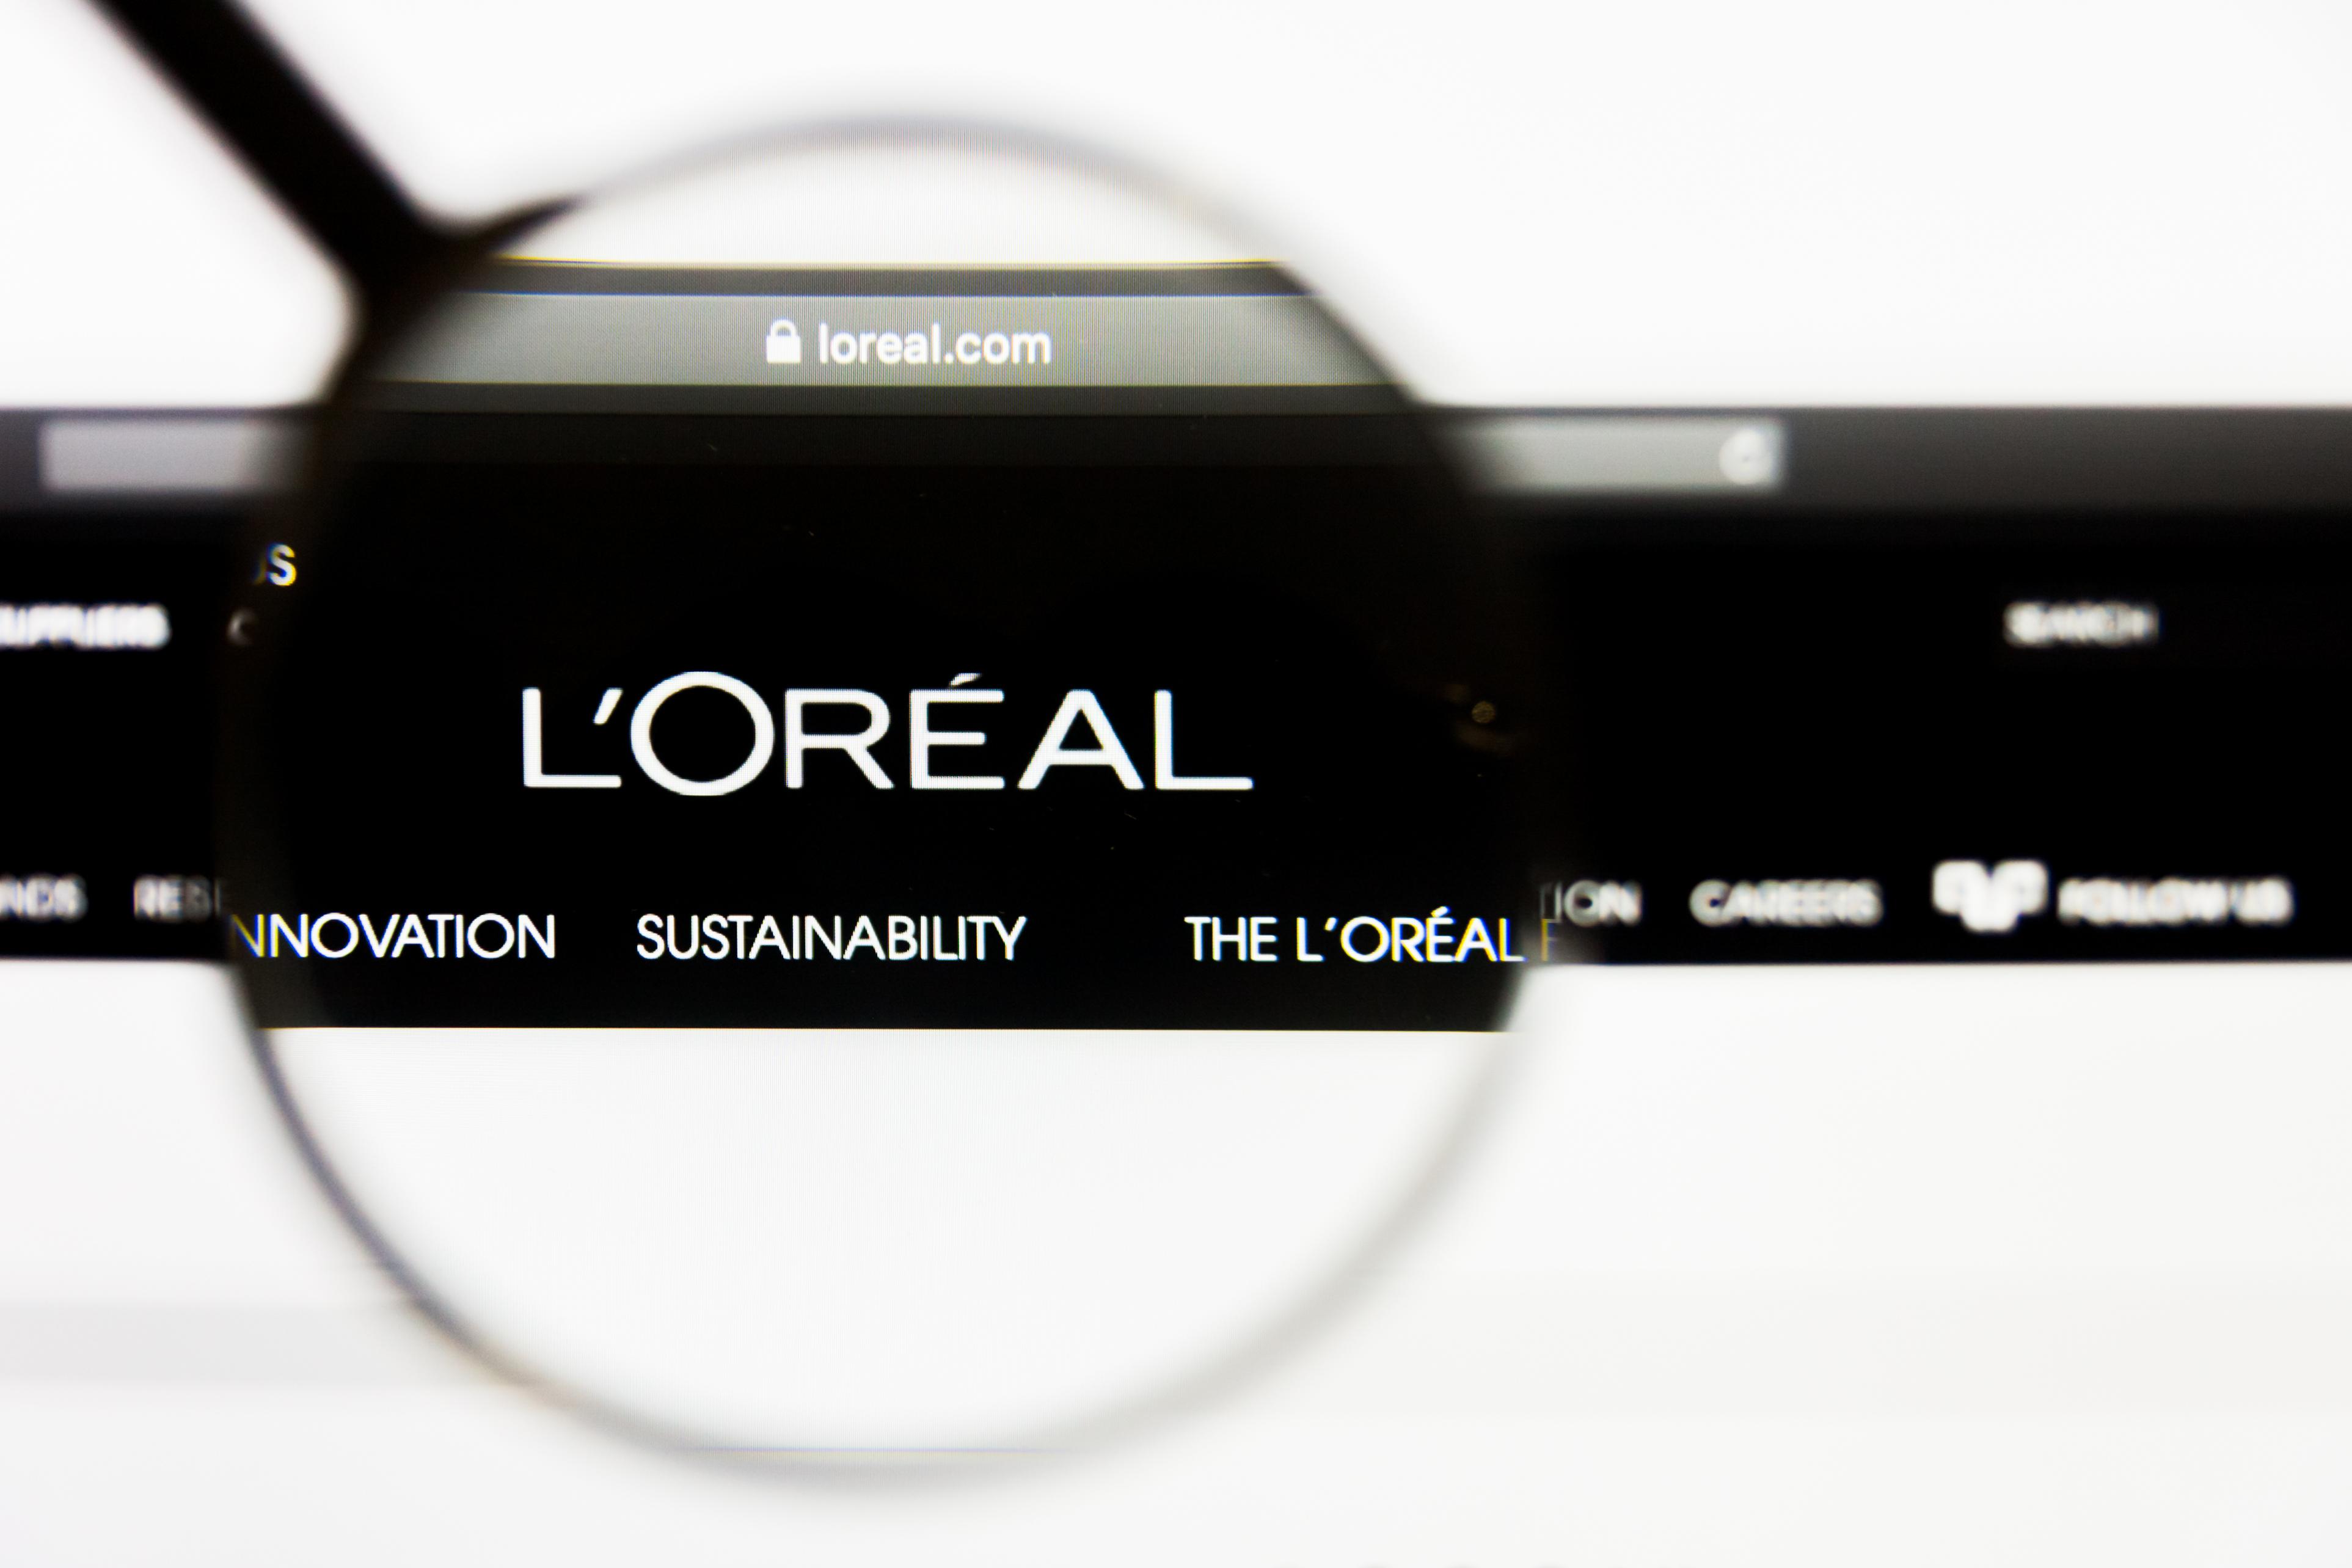 De olho no live commerce, L'Oreal Brasil aumenta vendas no e-commerce